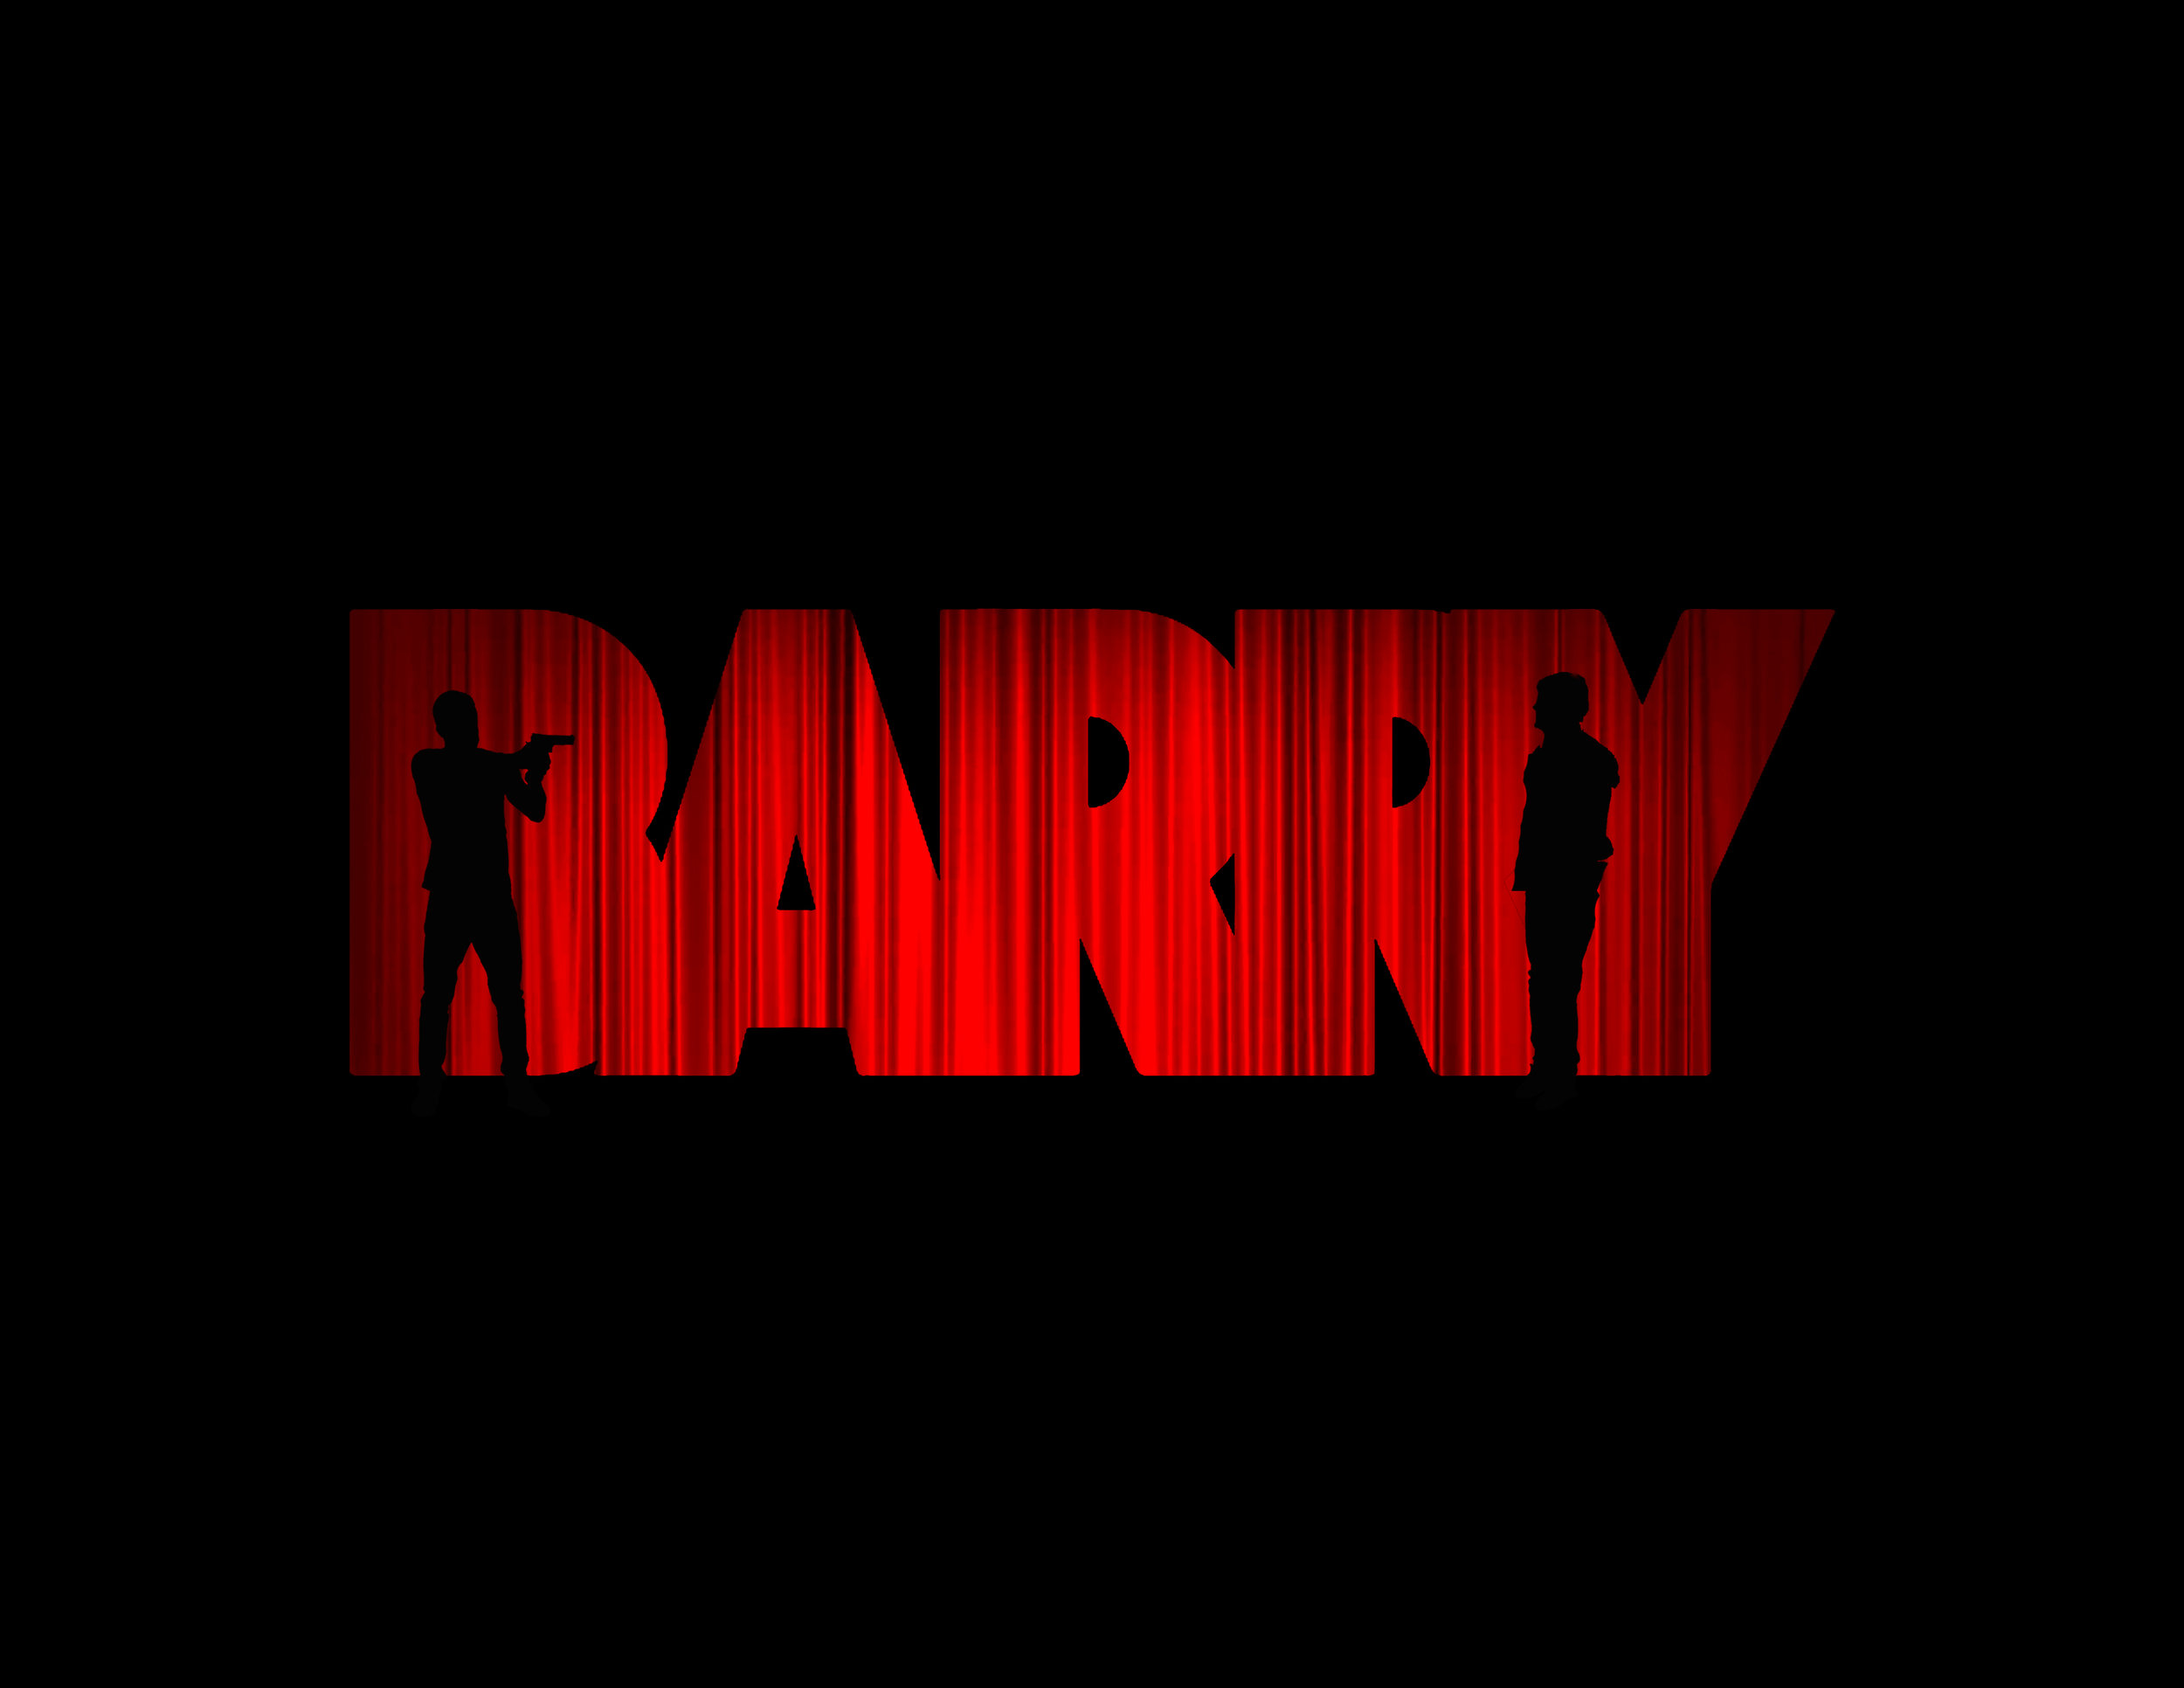 BarryLogoType.jpg